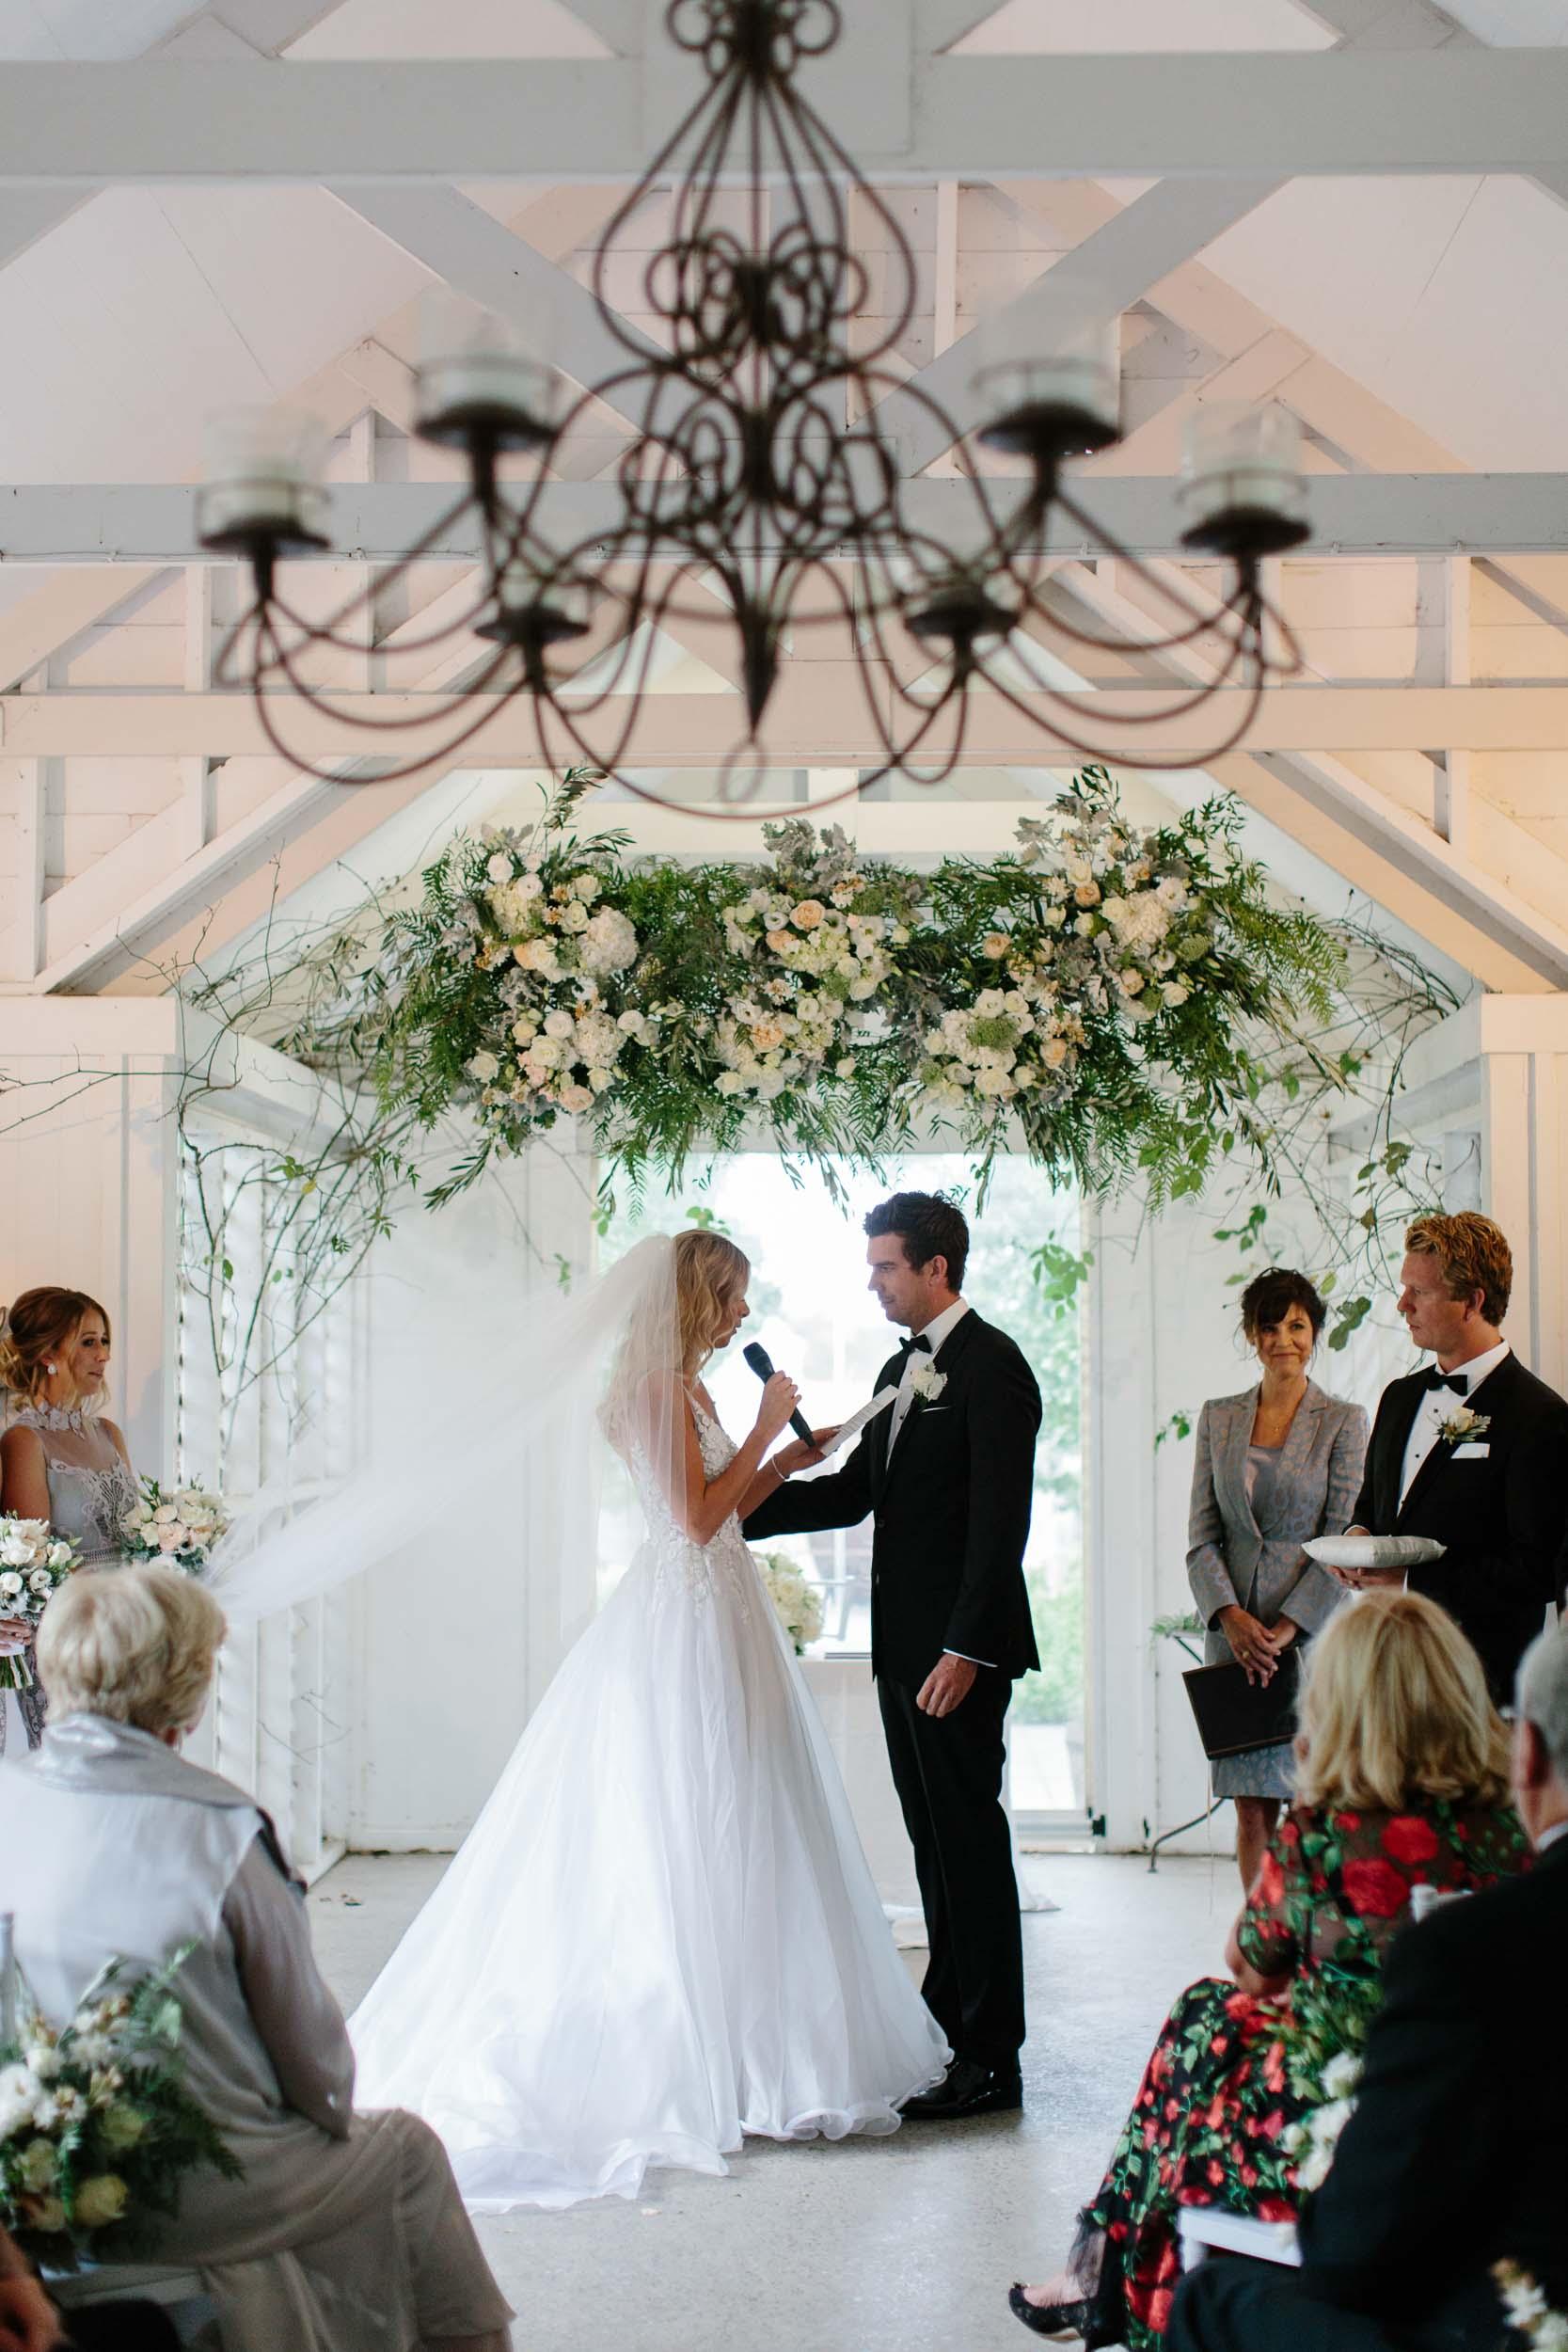 Kas-Richards-Mornington-Peninsula-Private-Property-Wedding-Marianna-Hardwick-Gown-274.jpg